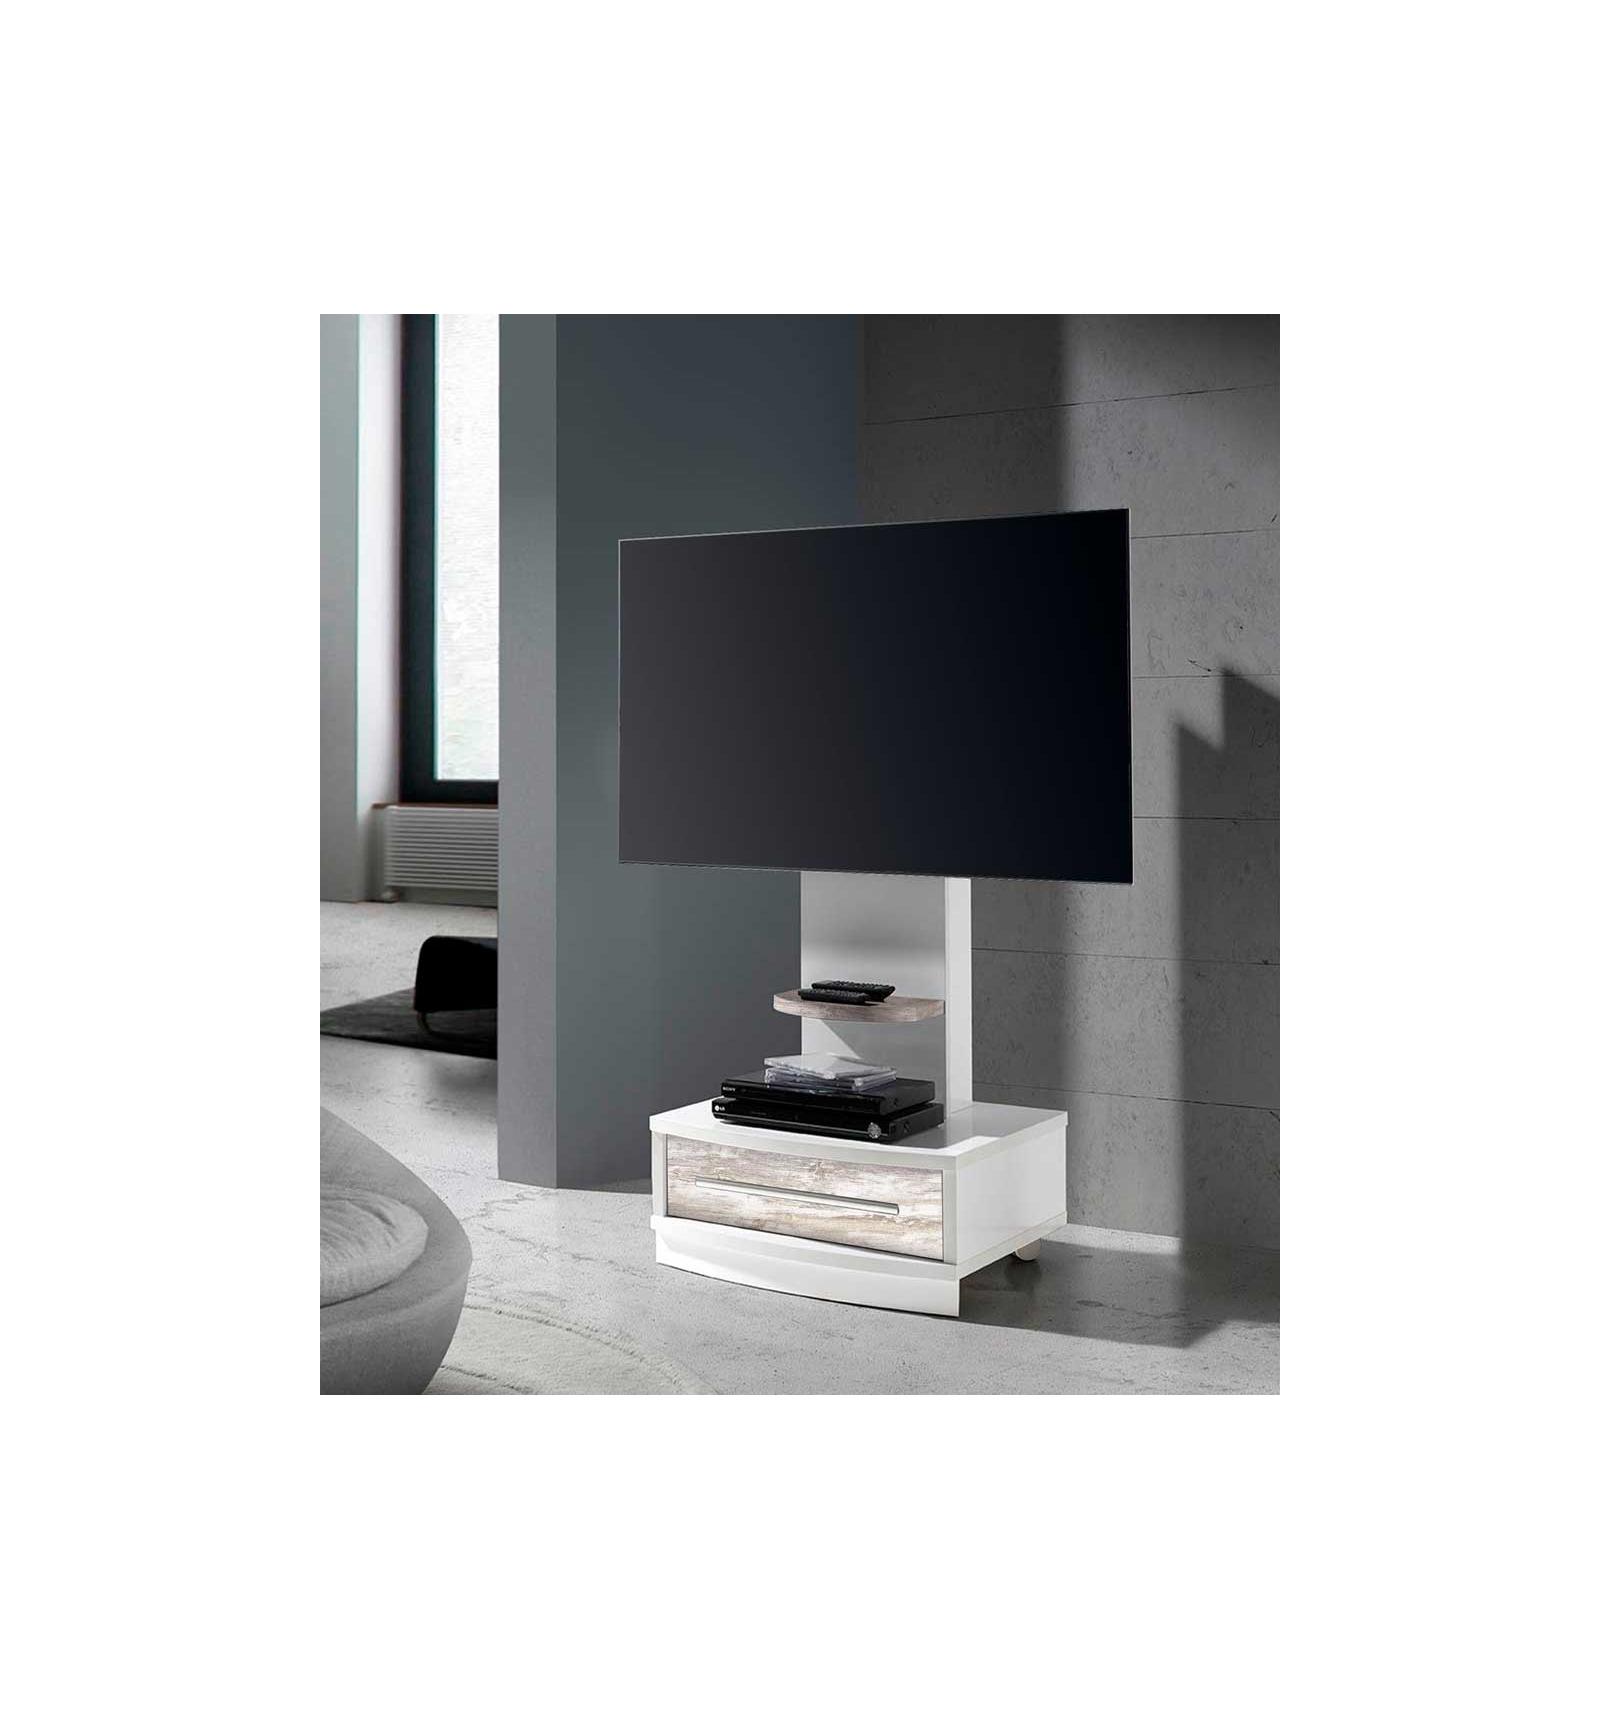 Mueble de tv for Mueble compacto tv